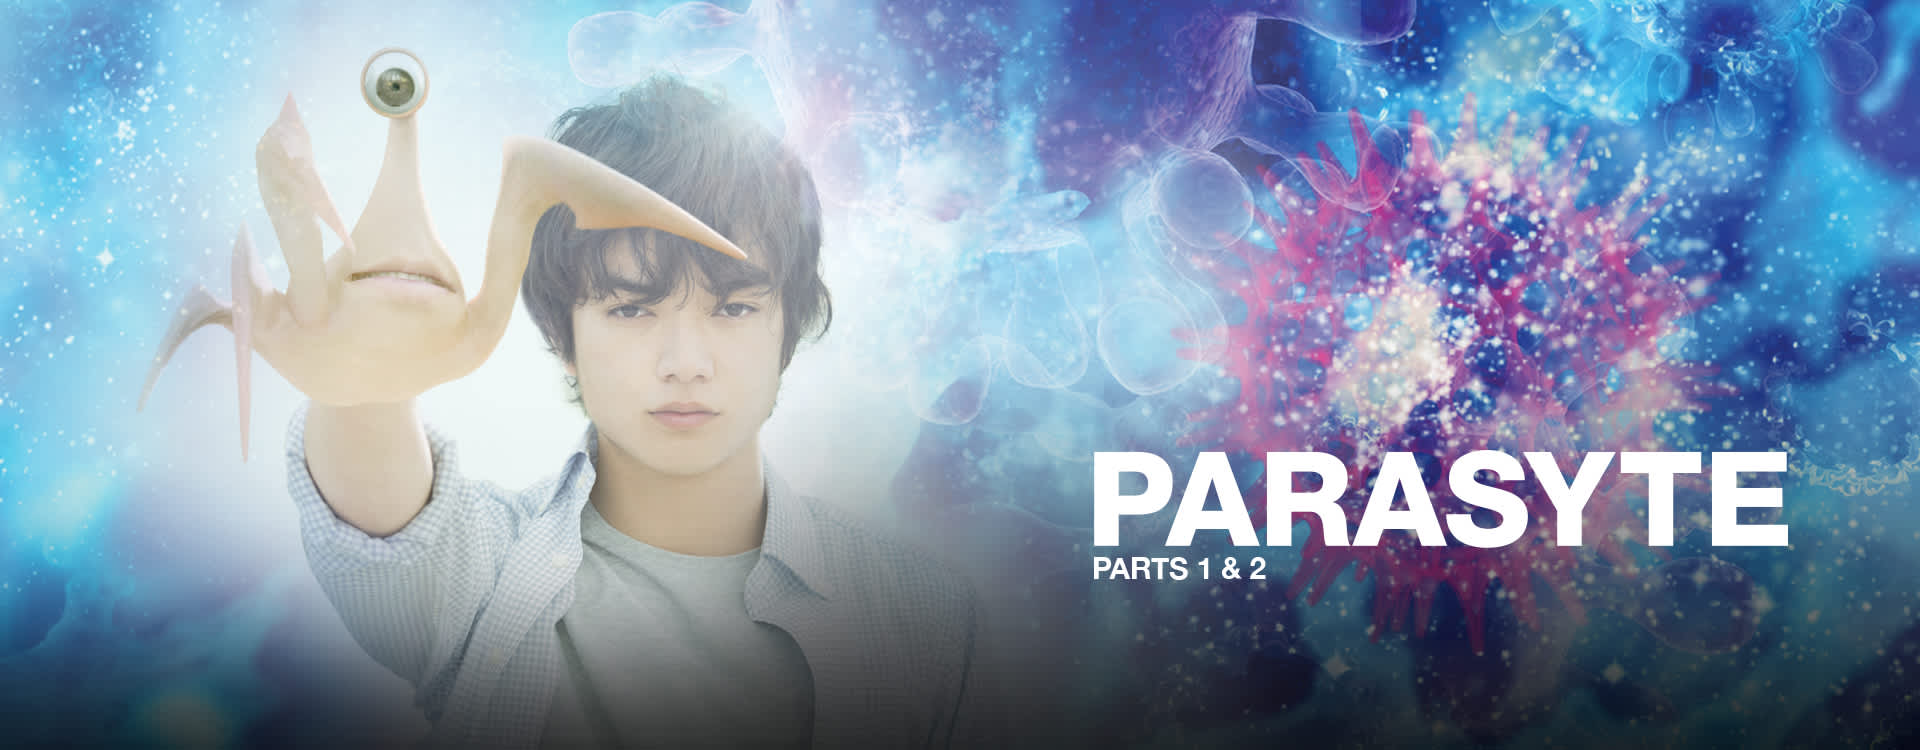 parasyte 2 english subtitle